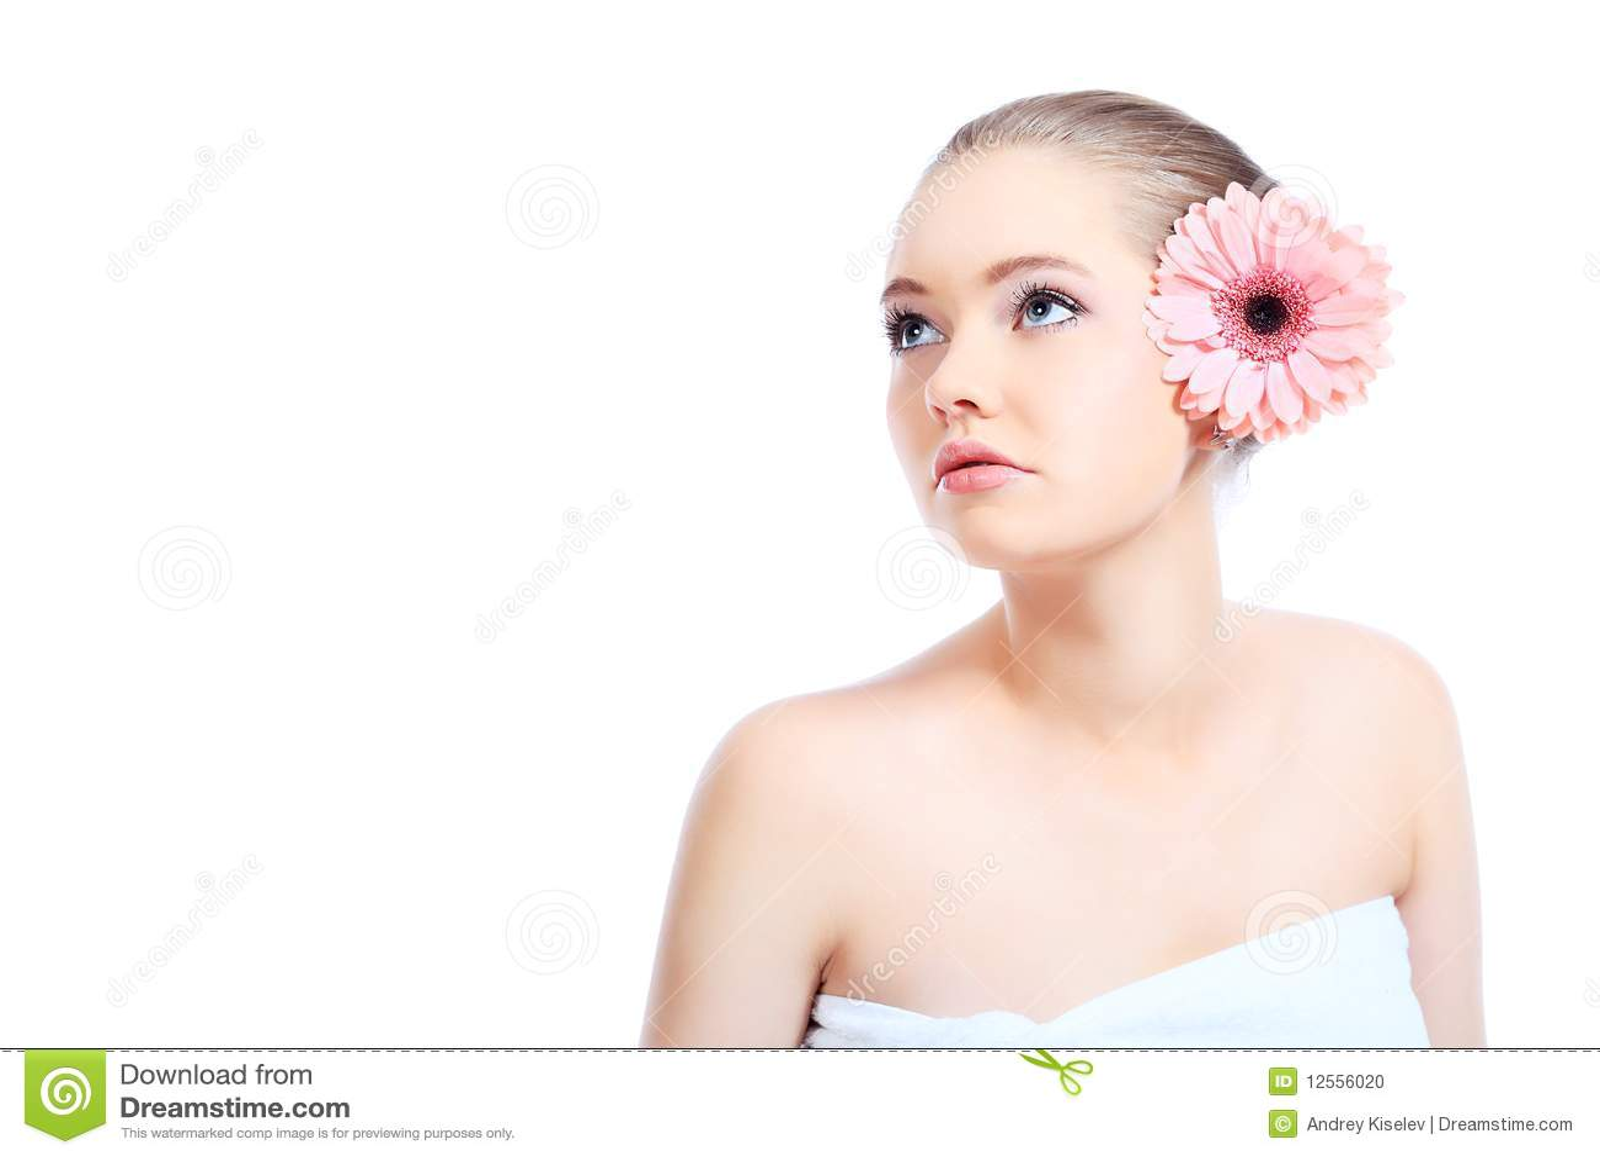 skin-care-12556020.jpg